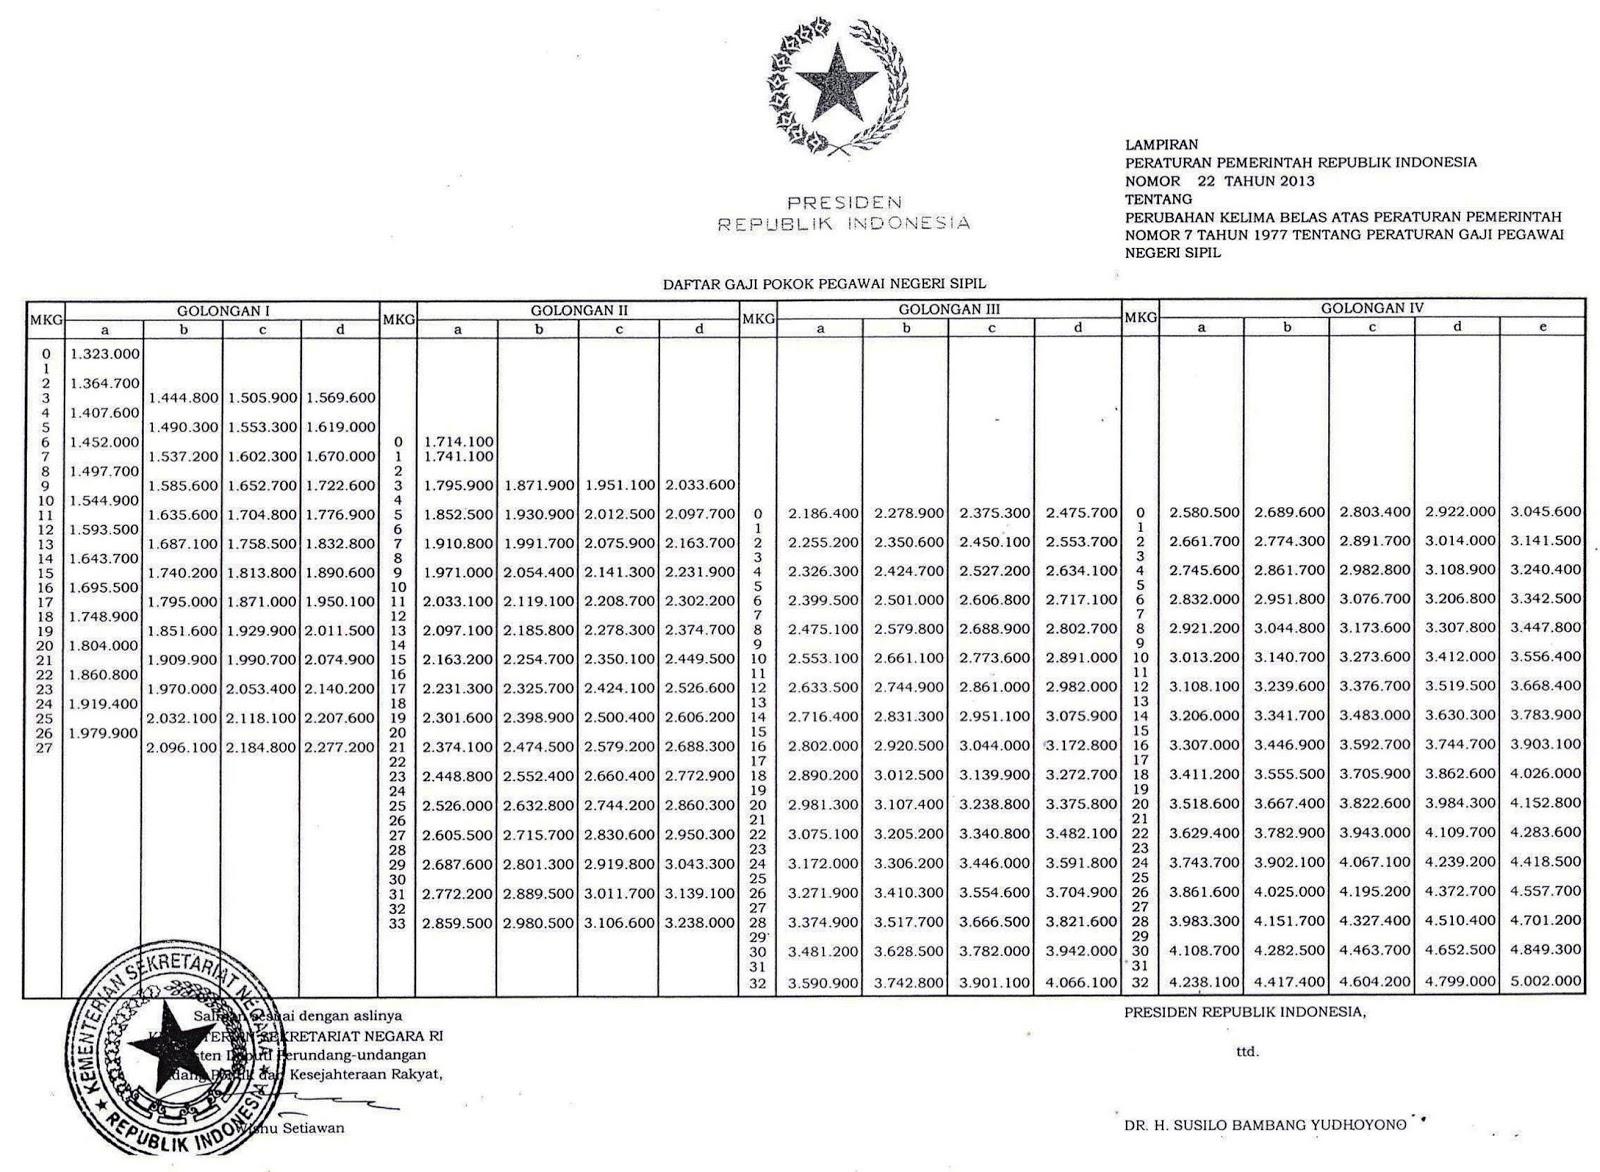 Daftar Kenaikan Gaji PNS PP 22 Tahun 2013